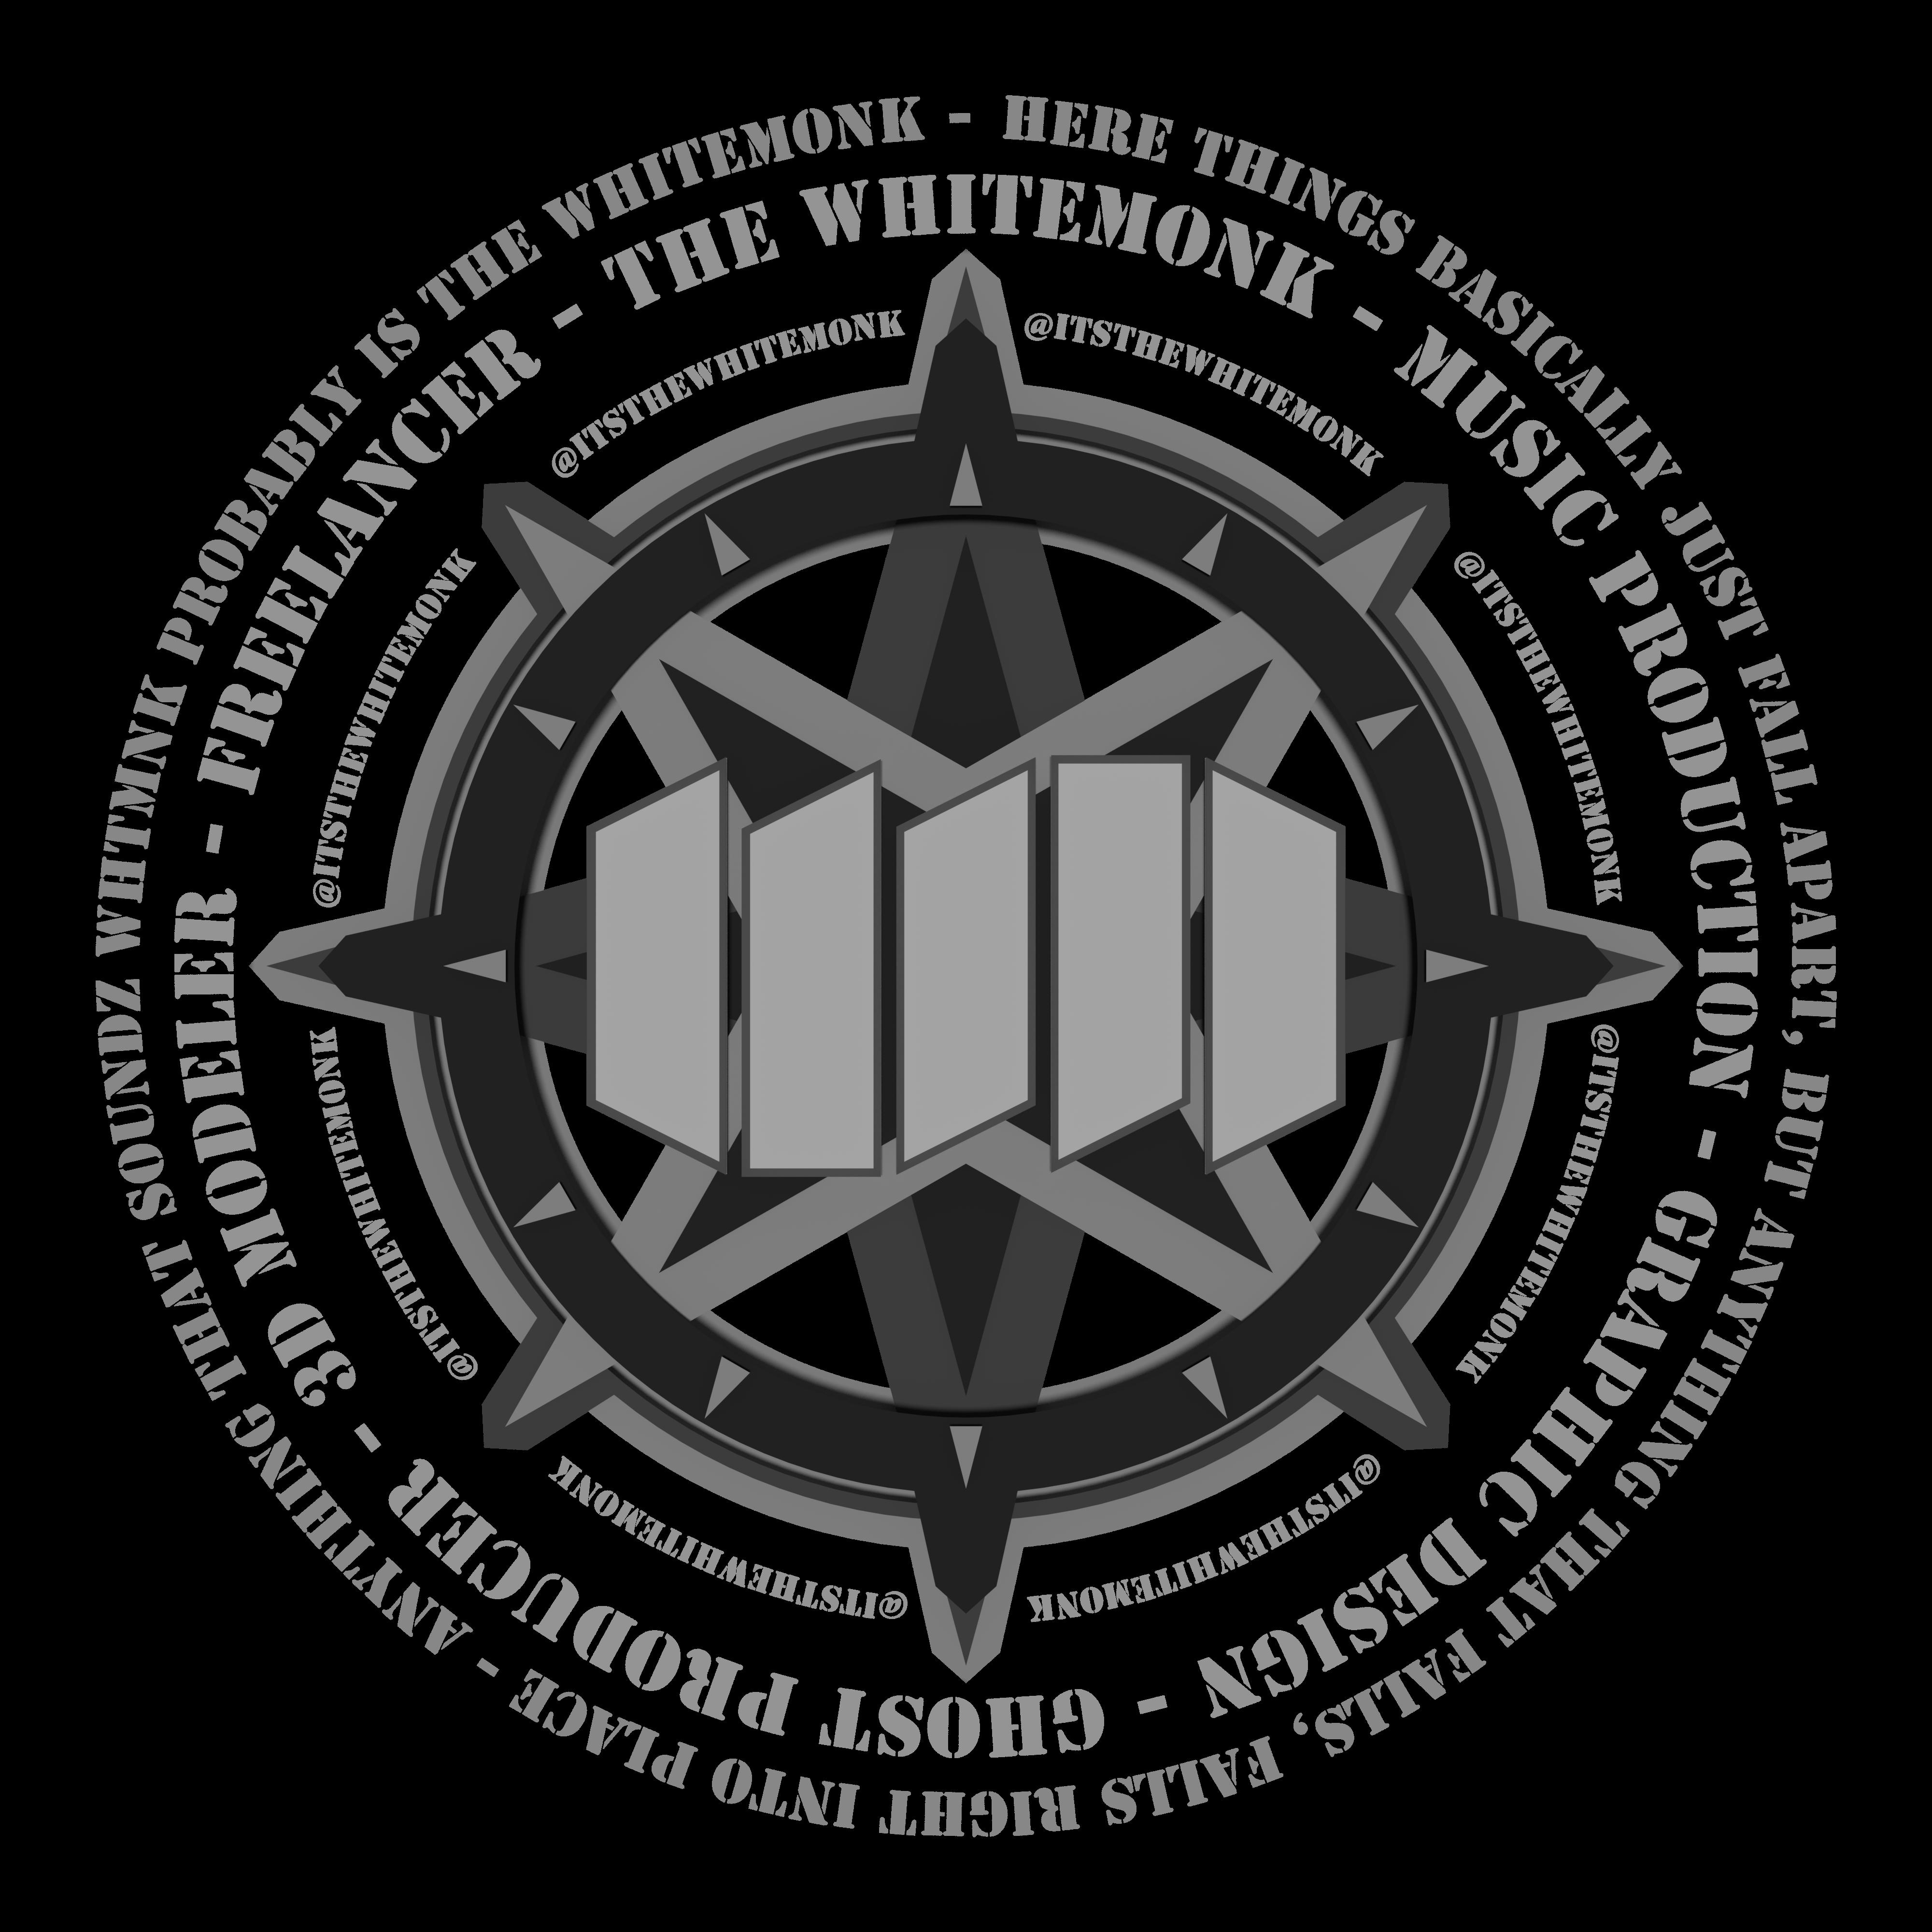 Whitemonk compass